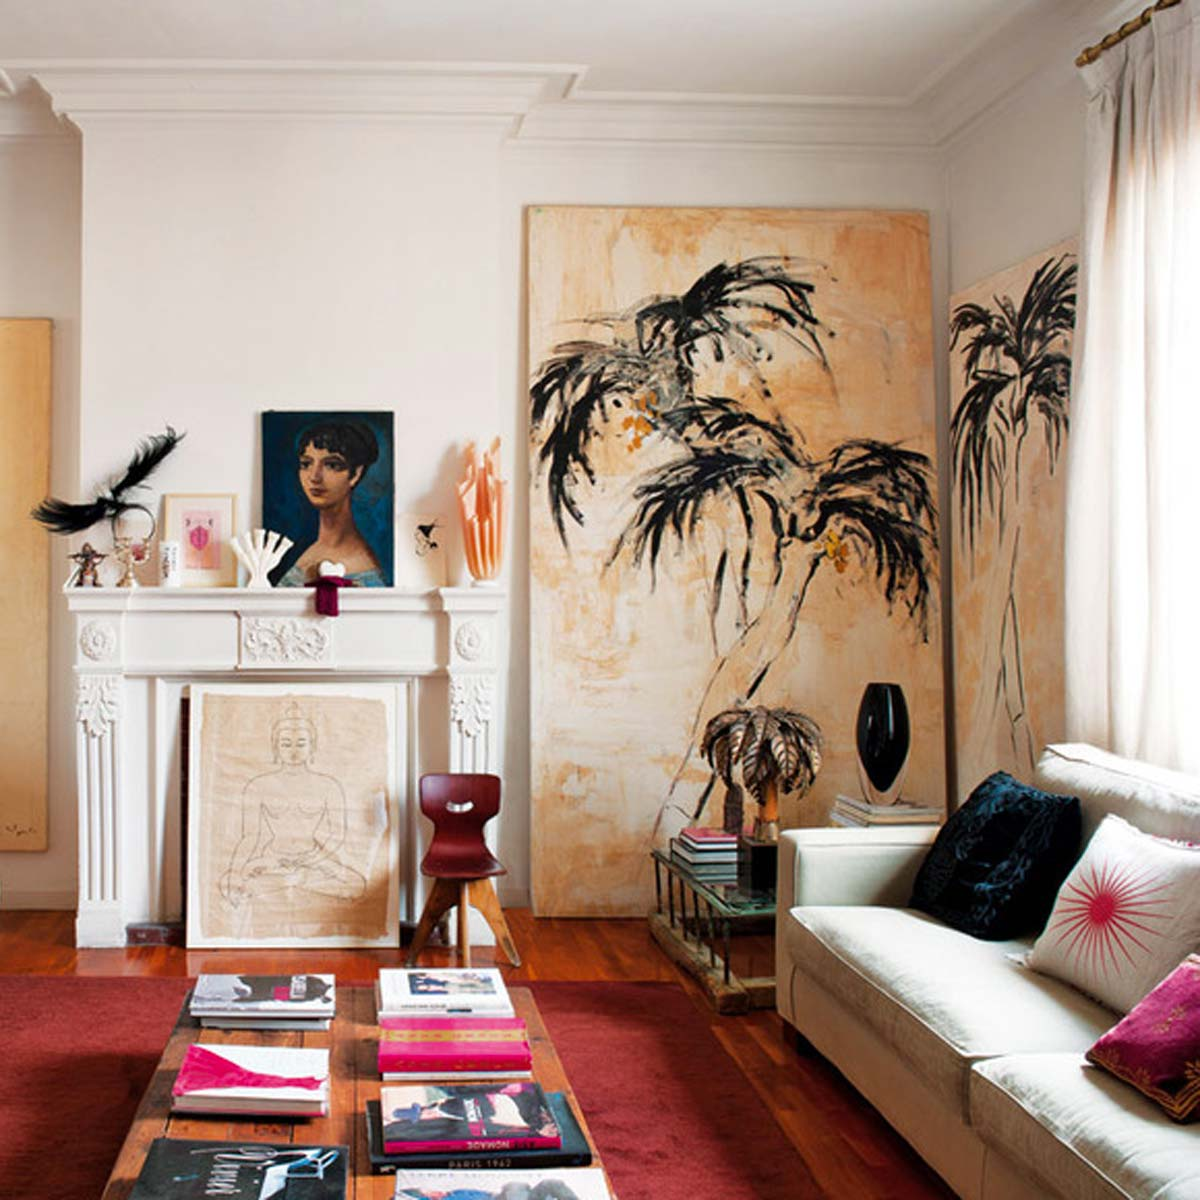 En casa de Lydia Delgado y Miranda Makaroff @mirandamakaroff  #MBFWM15 #FashionWeek @elle_es http://t.co/fhE1k6fFXN http://t.co/CgspmXh7RH